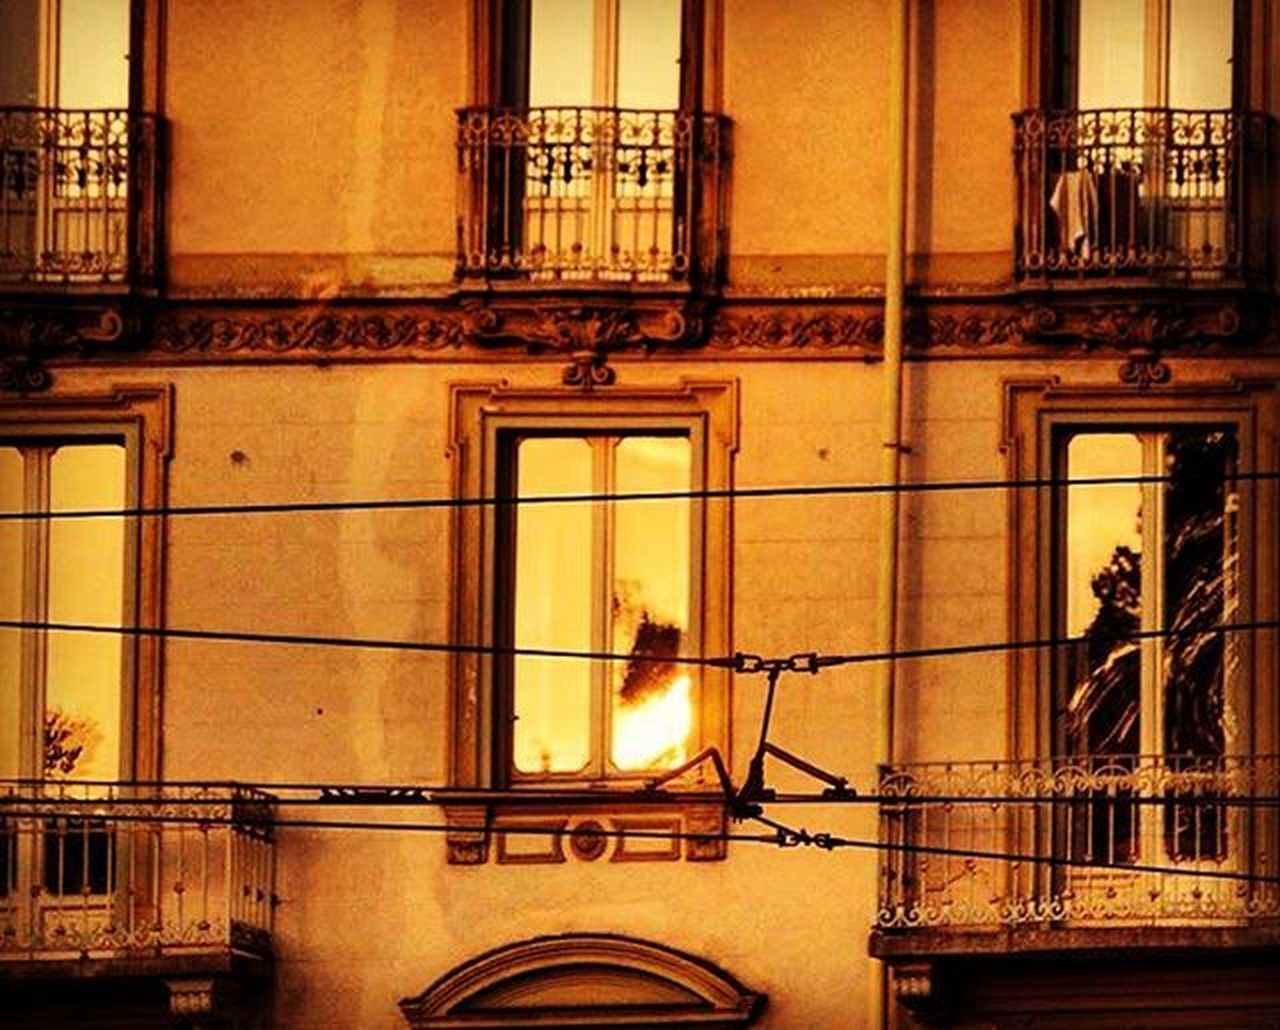 Good Morning Turin ☕️ •• Wishing you all un weekend meraviglioso !! Torino Torinoélamiacittá Torino_city Fermatato Torinodigitale Igersitalia Volgotorino Igerstorino Igerspiemonte Volgoitalia Volgopiemonte Turin Turinheart Cittaditorino VSCO Turismotorino Vivotorino